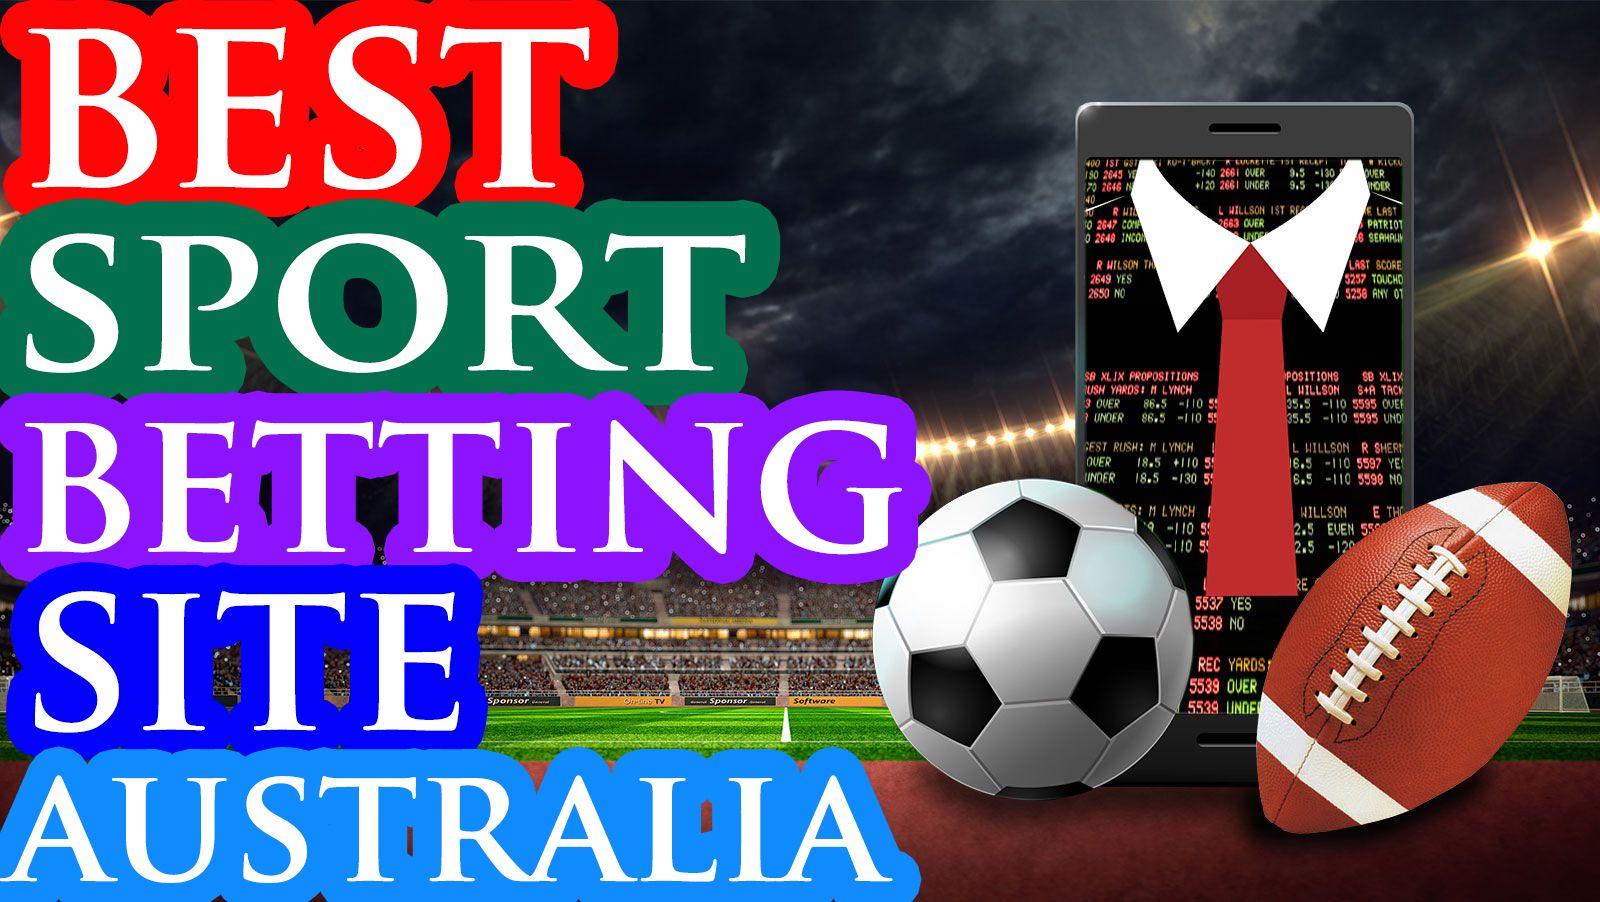 Aussie sports betting arbitrage torrent sports betting canada ufc